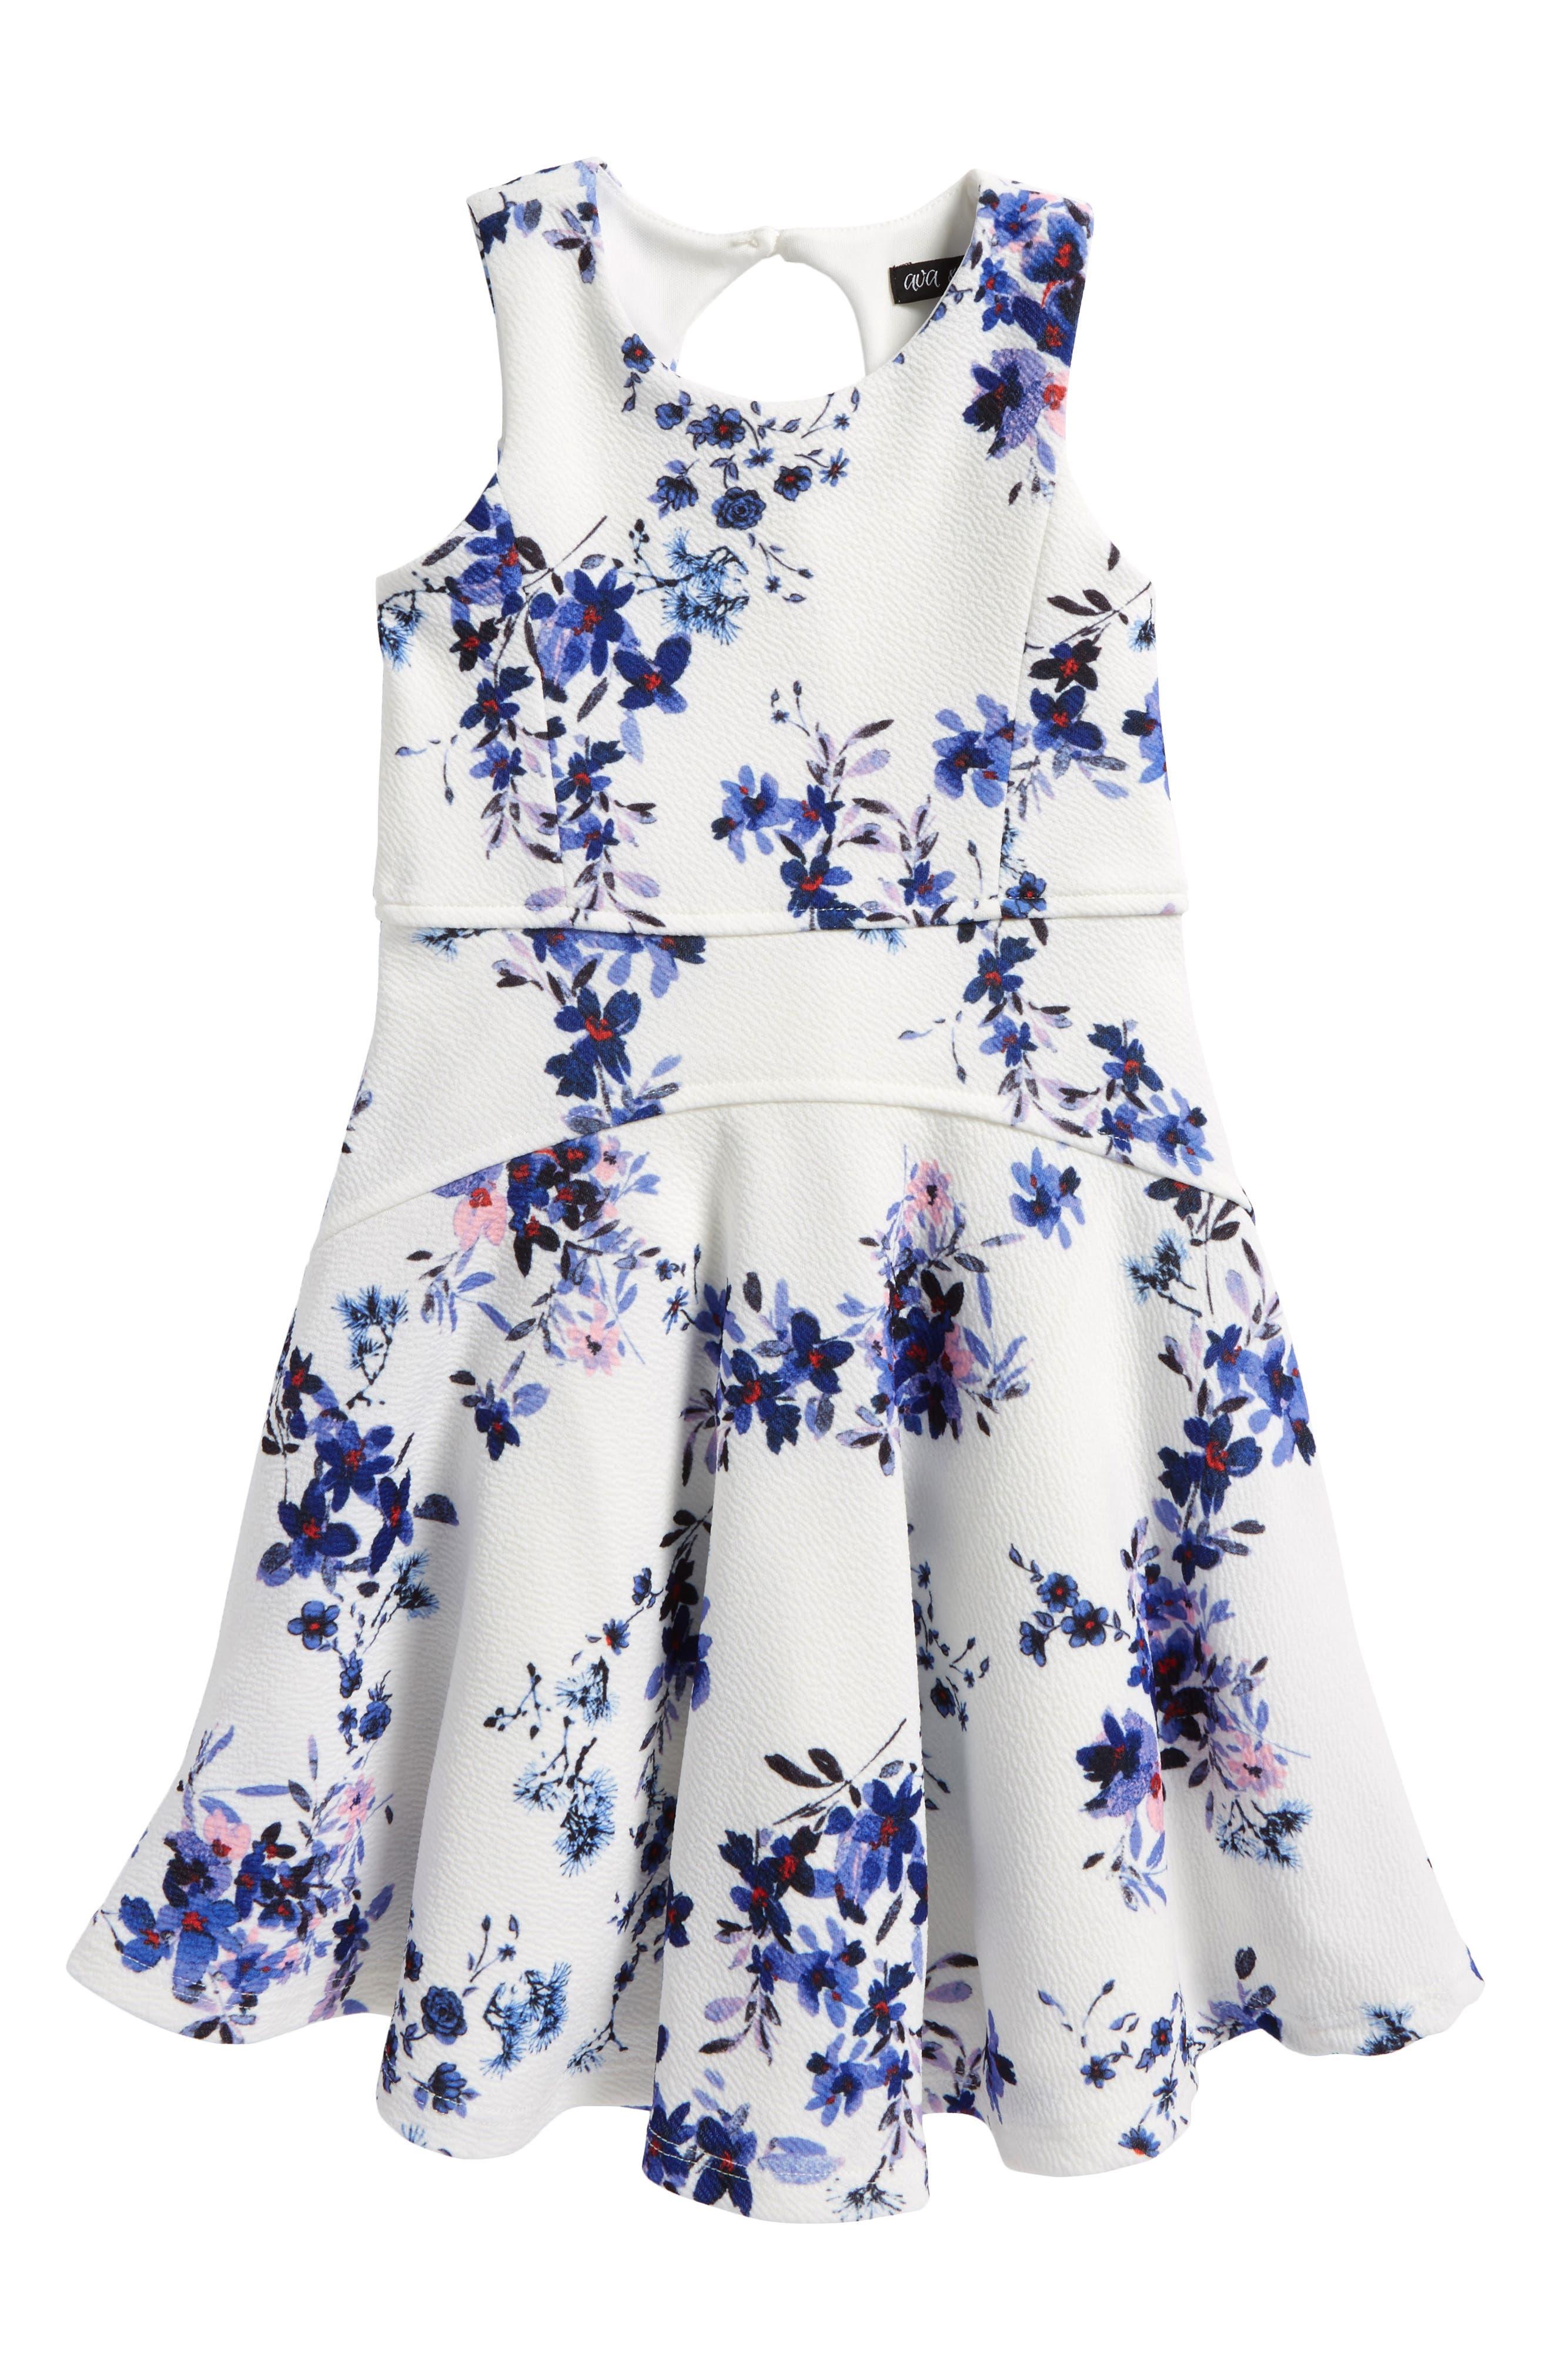 Floral Print Skater Dress,                             Main thumbnail 1, color,                             White/ Blue